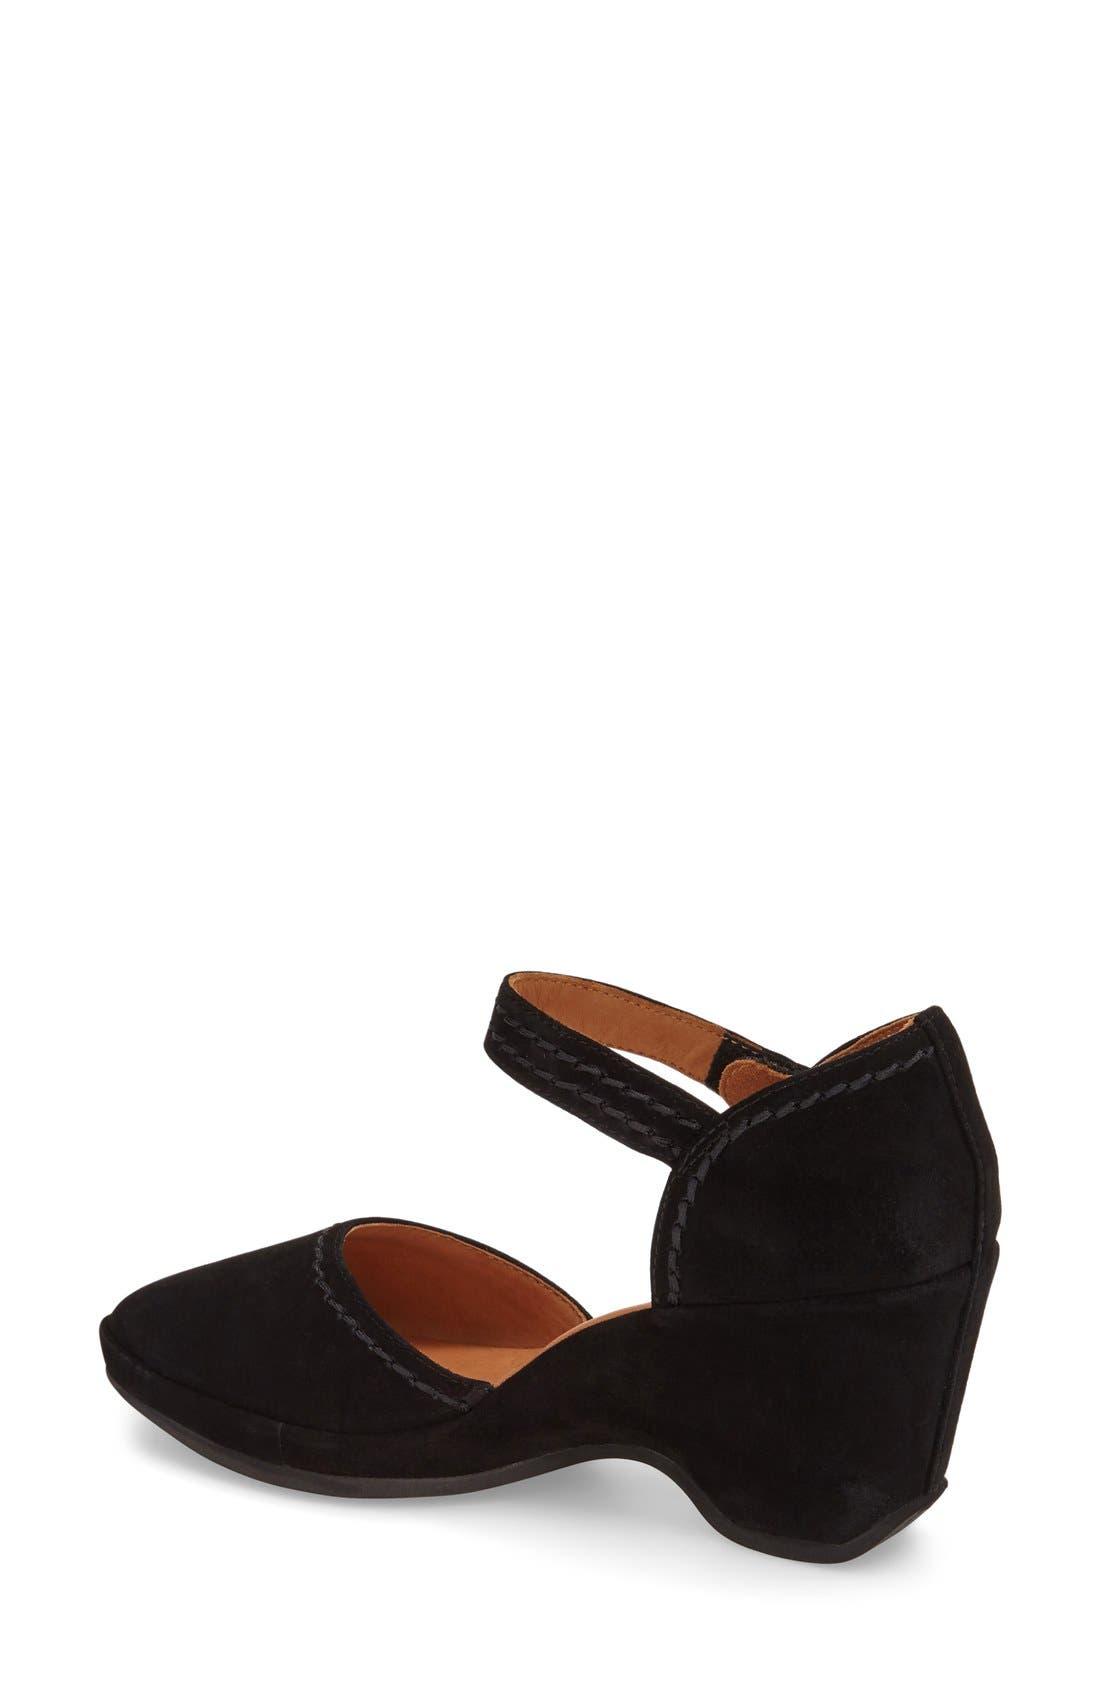 L'Amourdes Pieds'Orva' Wedge Sandal,                             Alternate thumbnail 2, color,                             BLACK KIDSUEDE